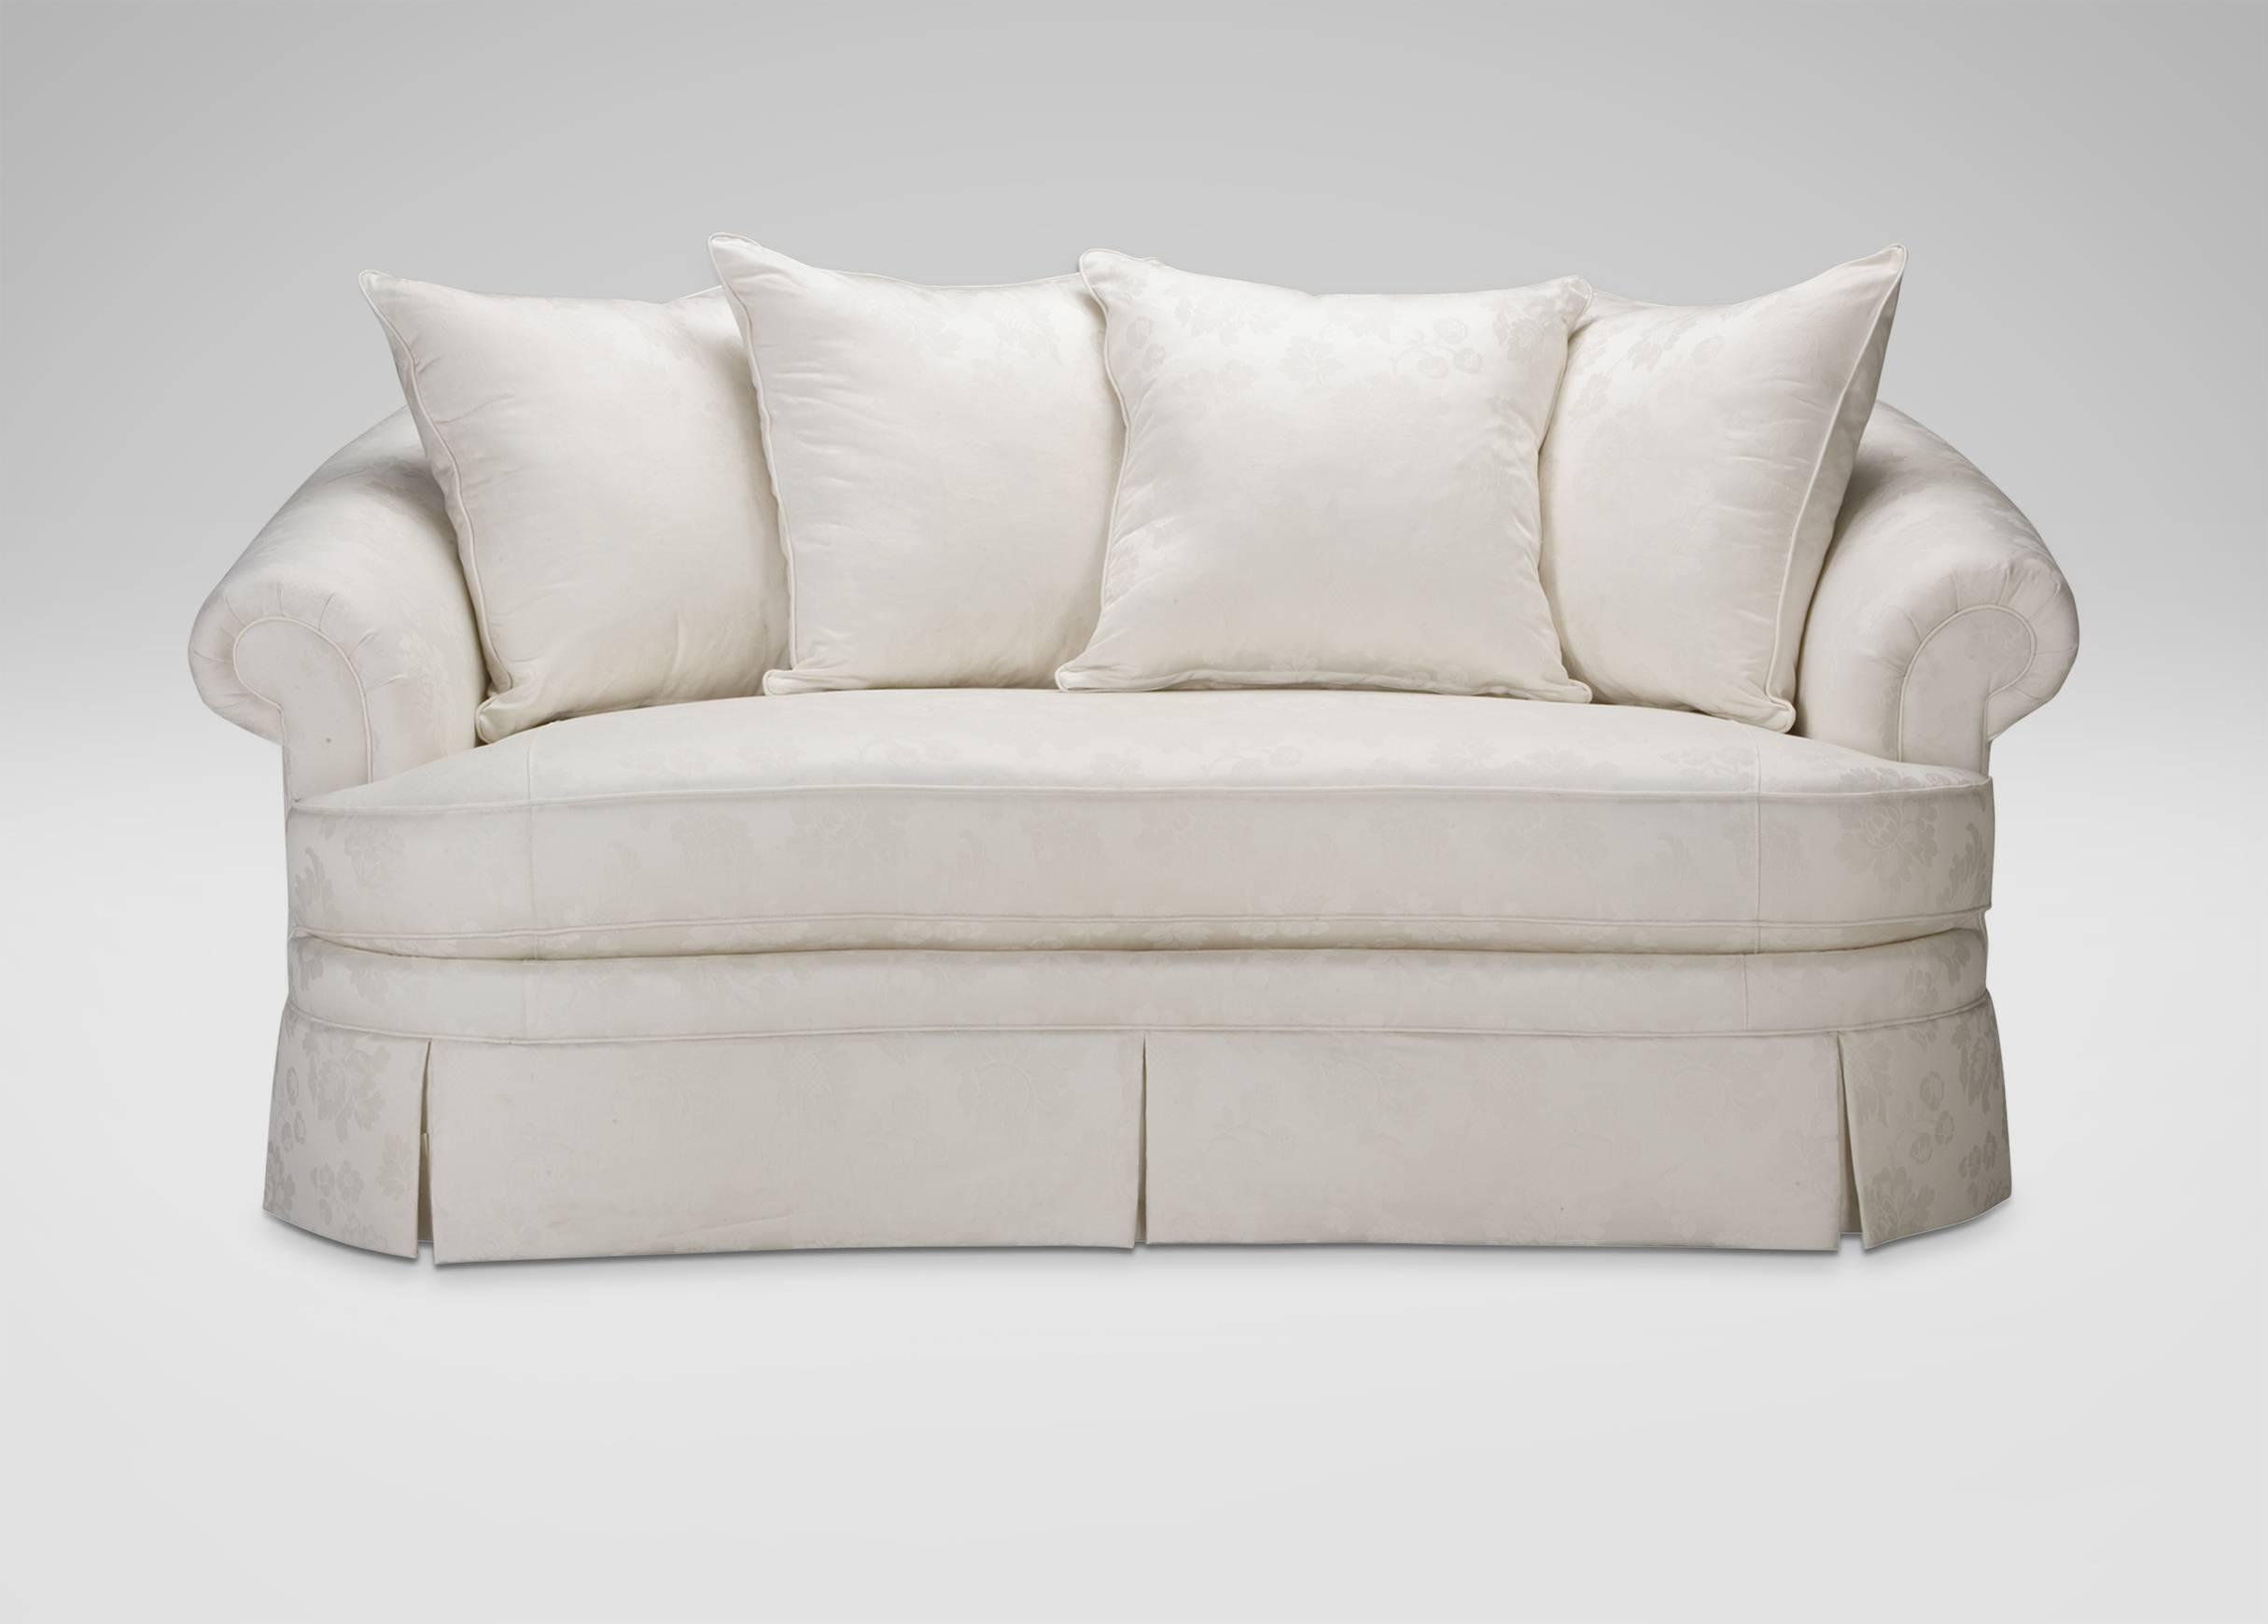 Paris Bench-Cushion Sofa | Sofas & Loveseats with Bench Cushion Sofas (Image 9 of 15)